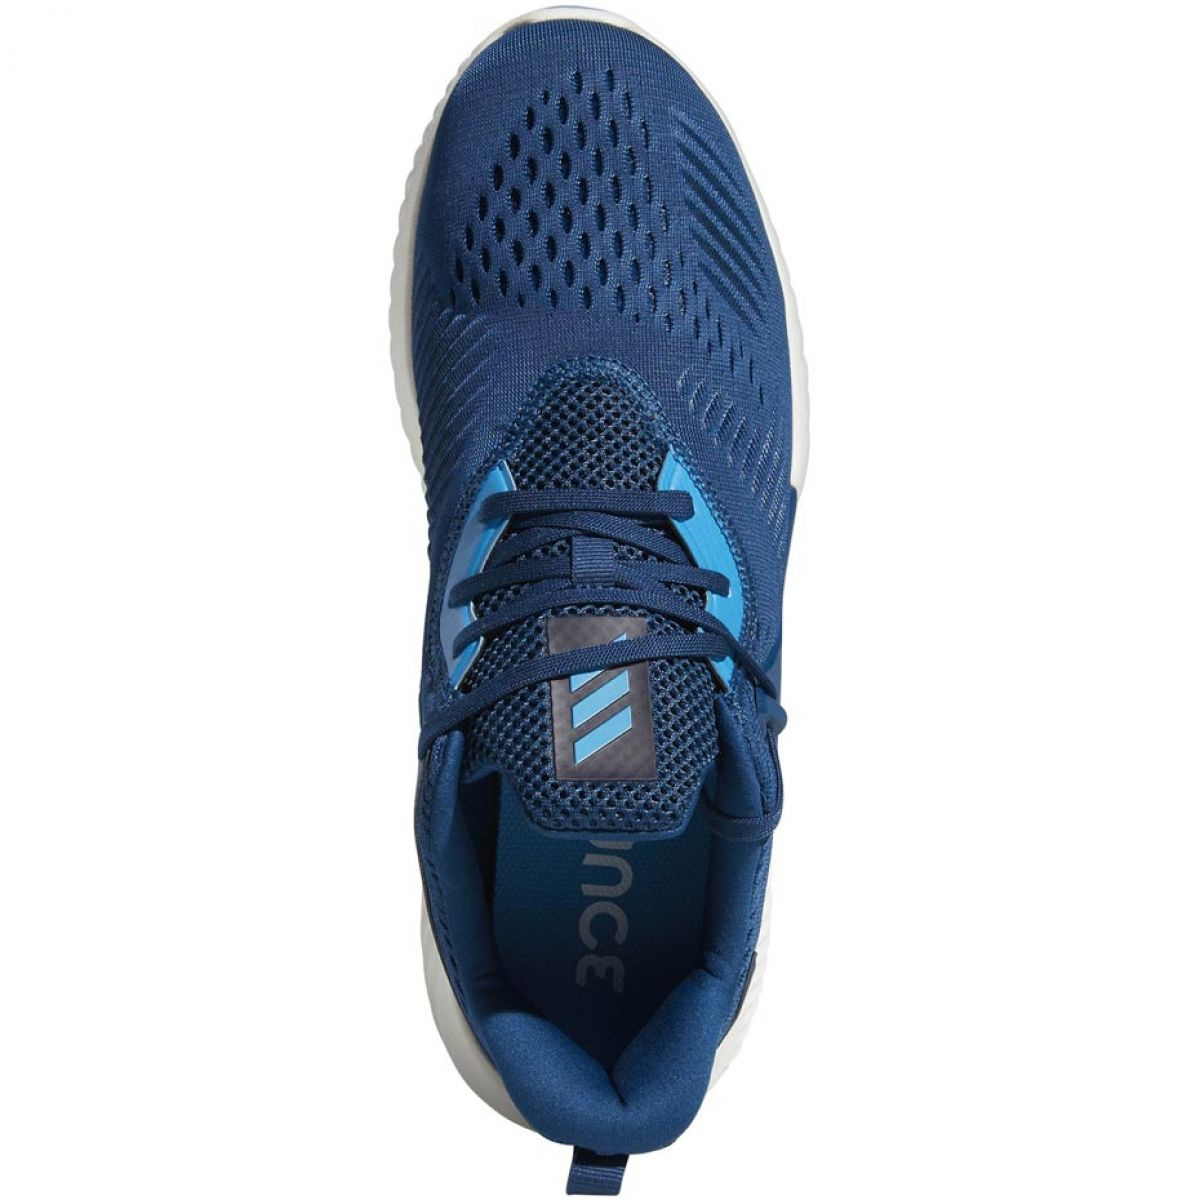 Soldes > adidas alphabounce rc 2 blue > en stock